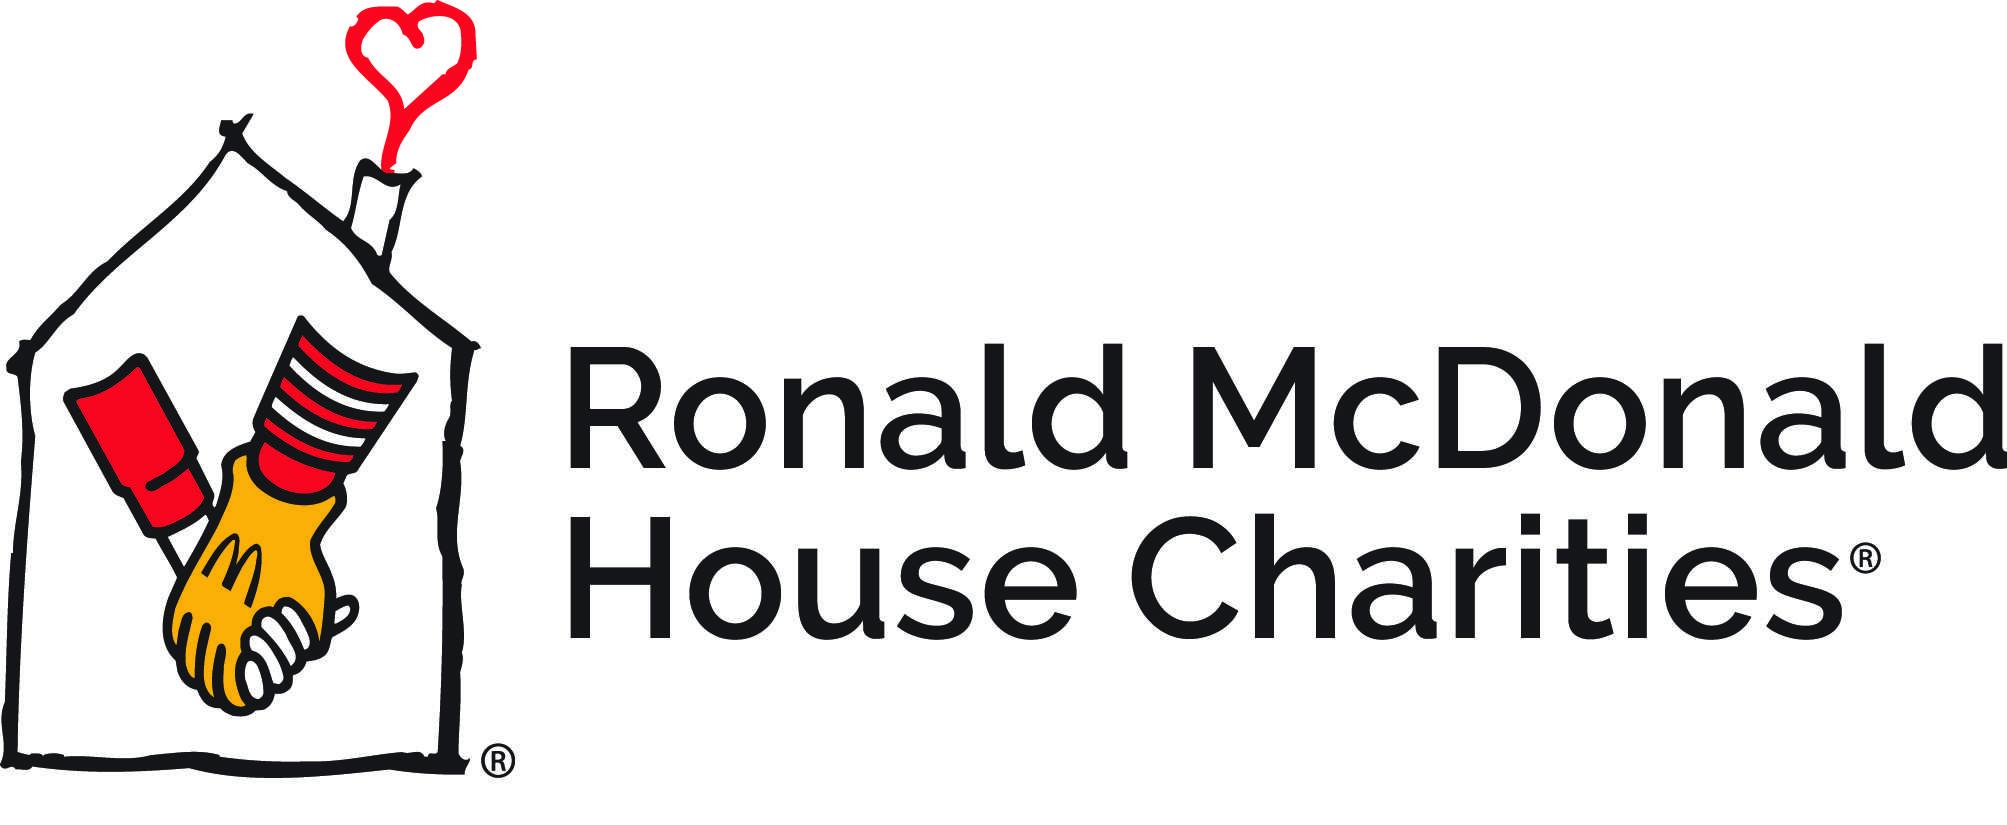 logo for Ronald McDonald House Charities